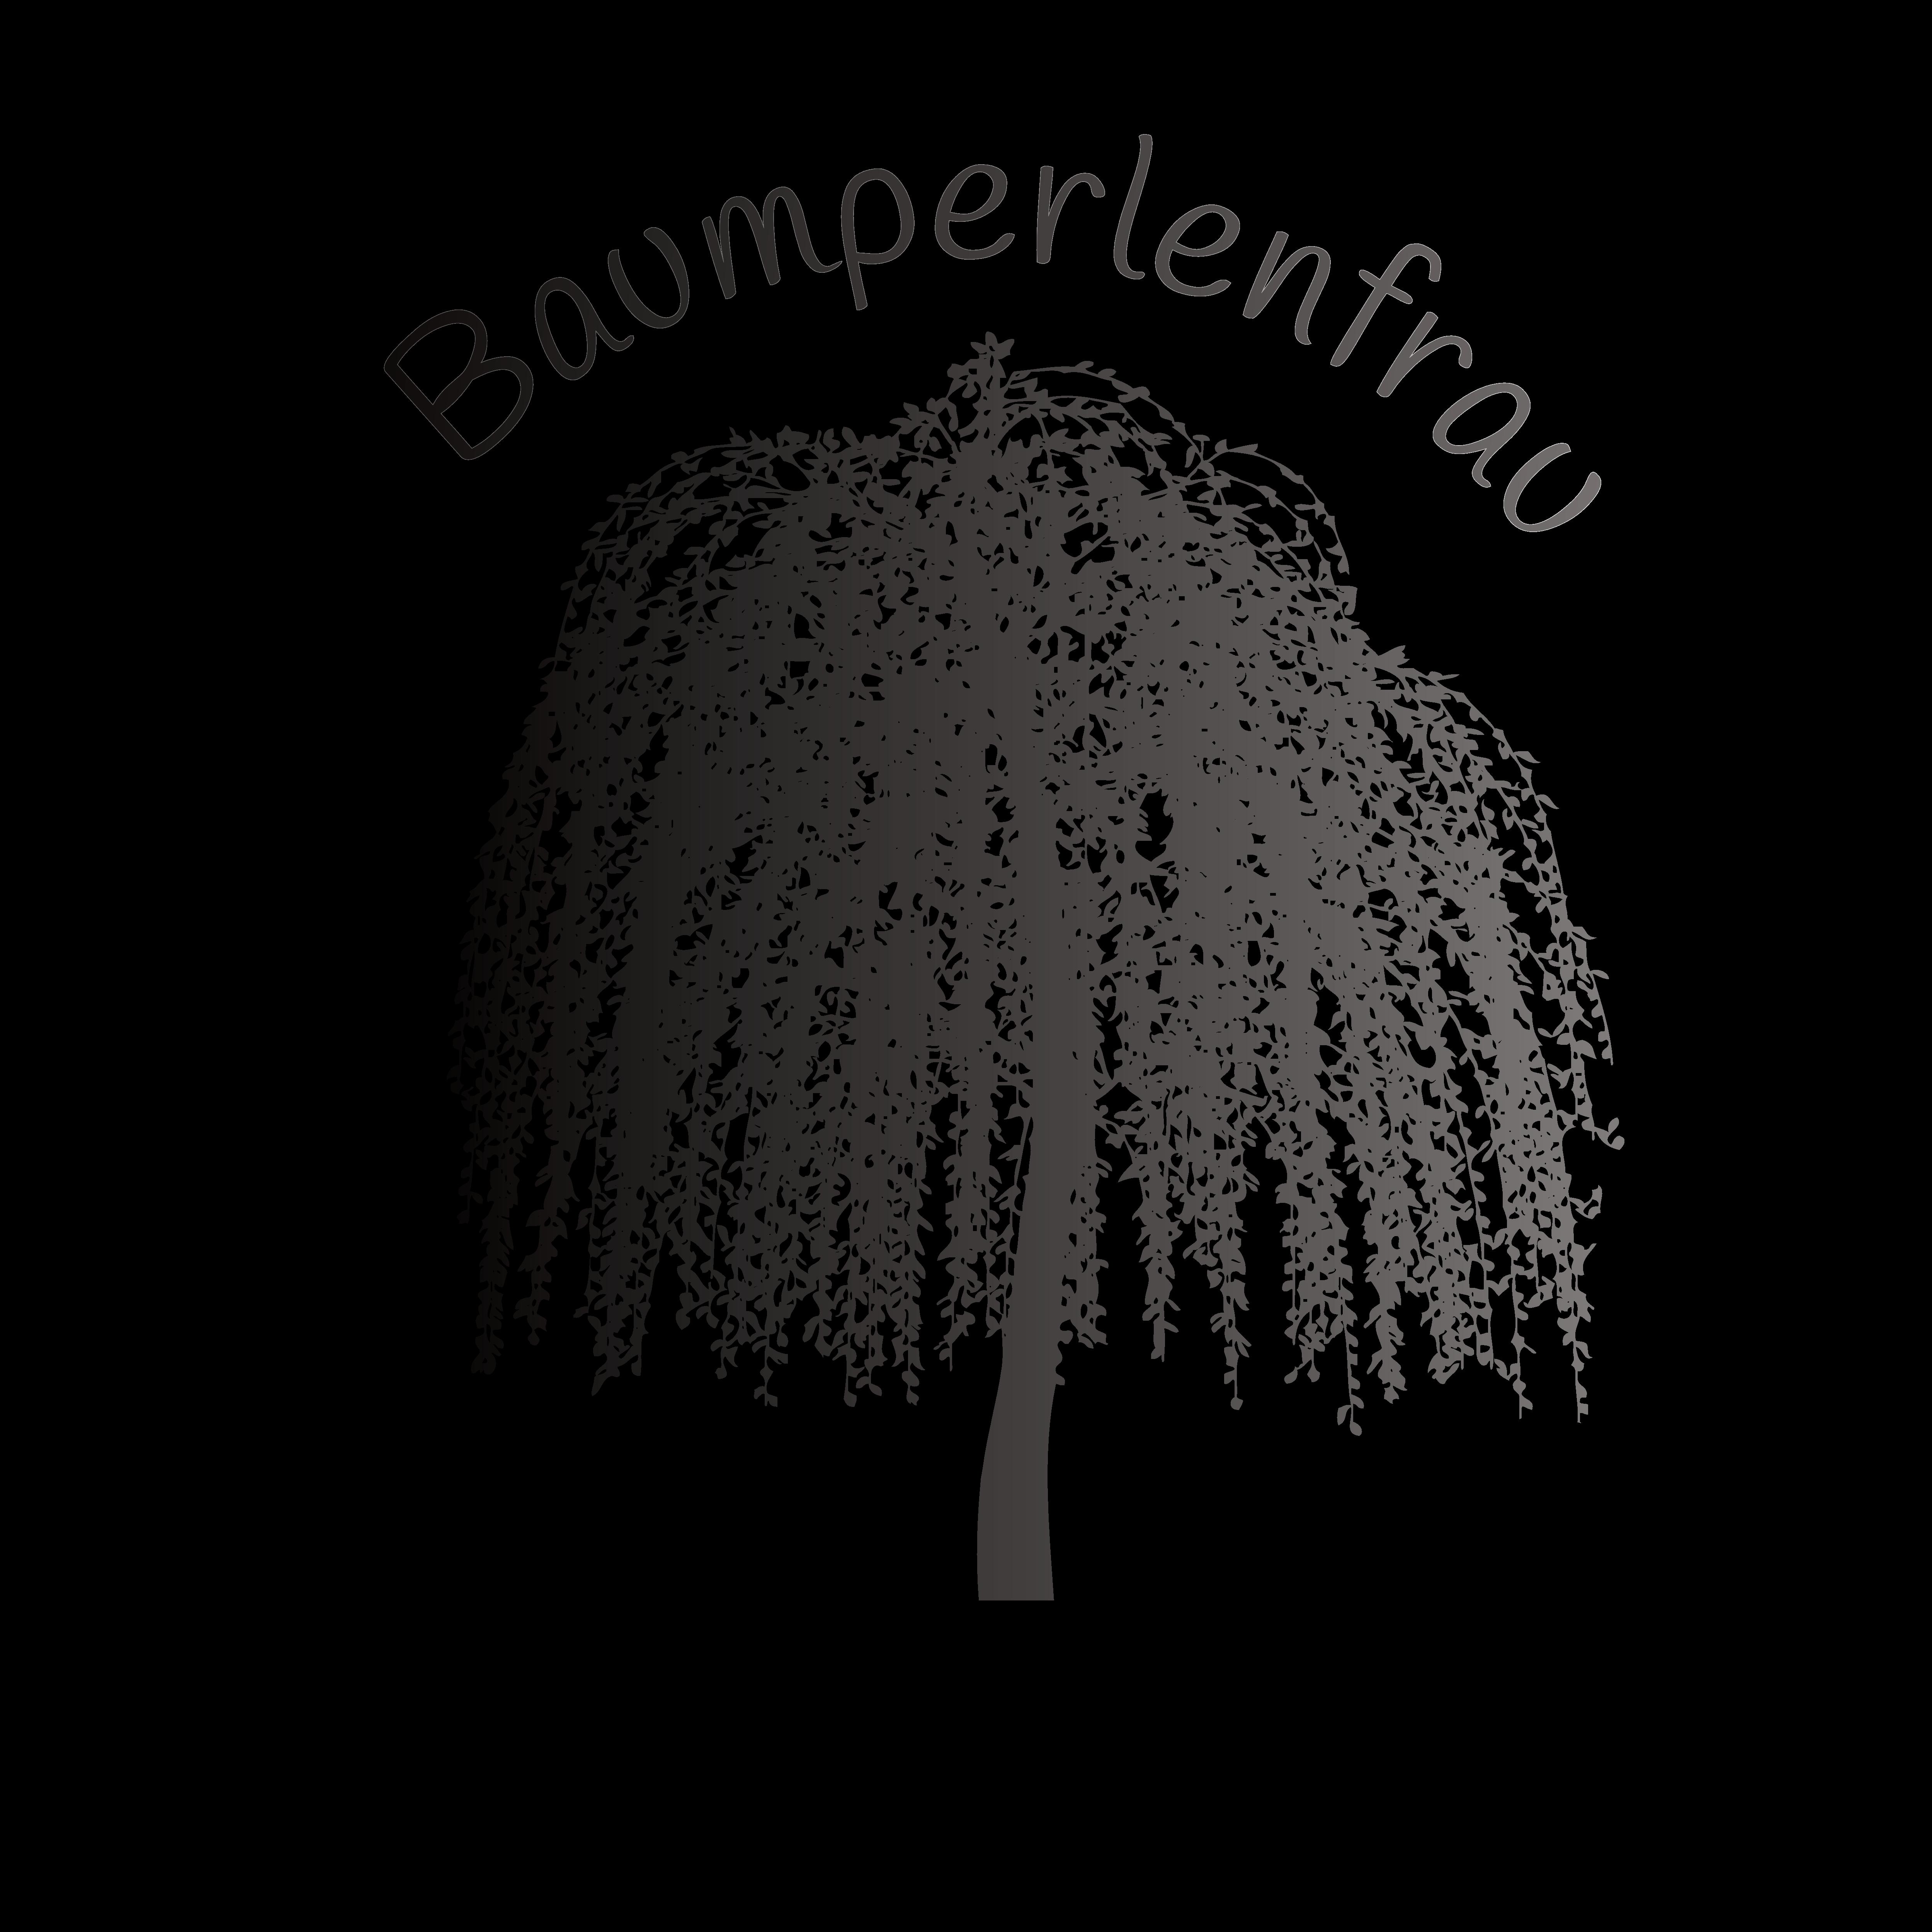 Baumperlenfrau